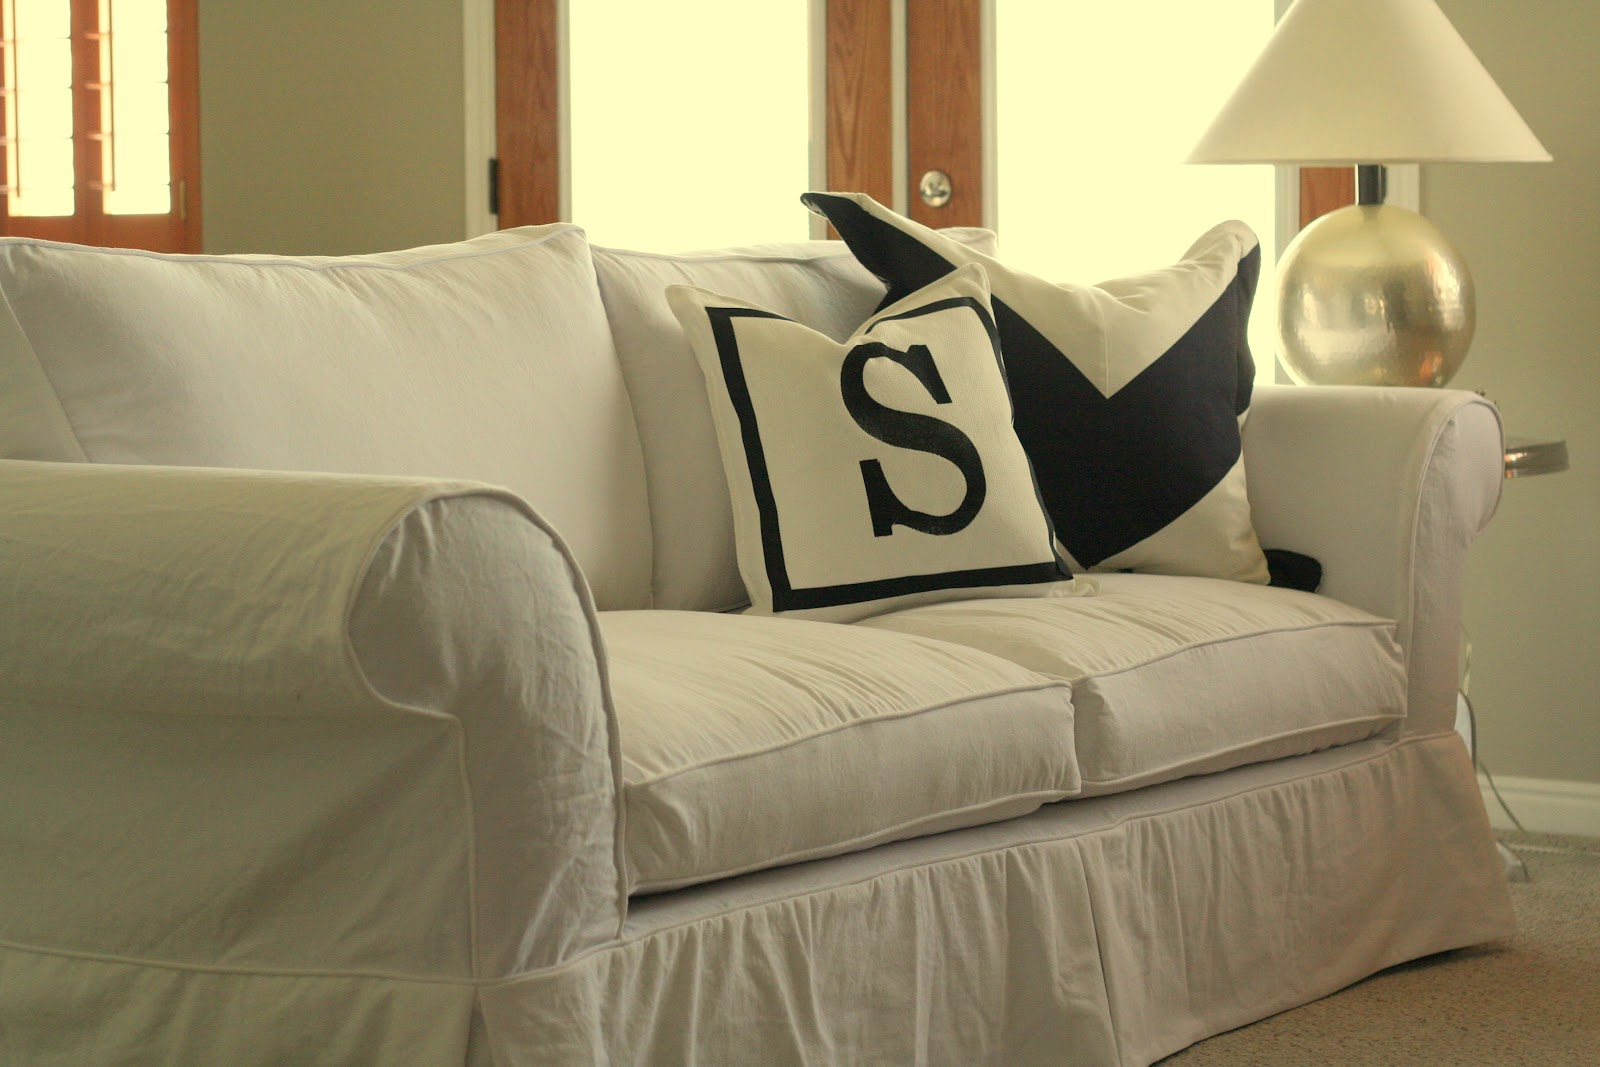 Twill Slipcovers For Sofas Baldwin Sofa From Ballard